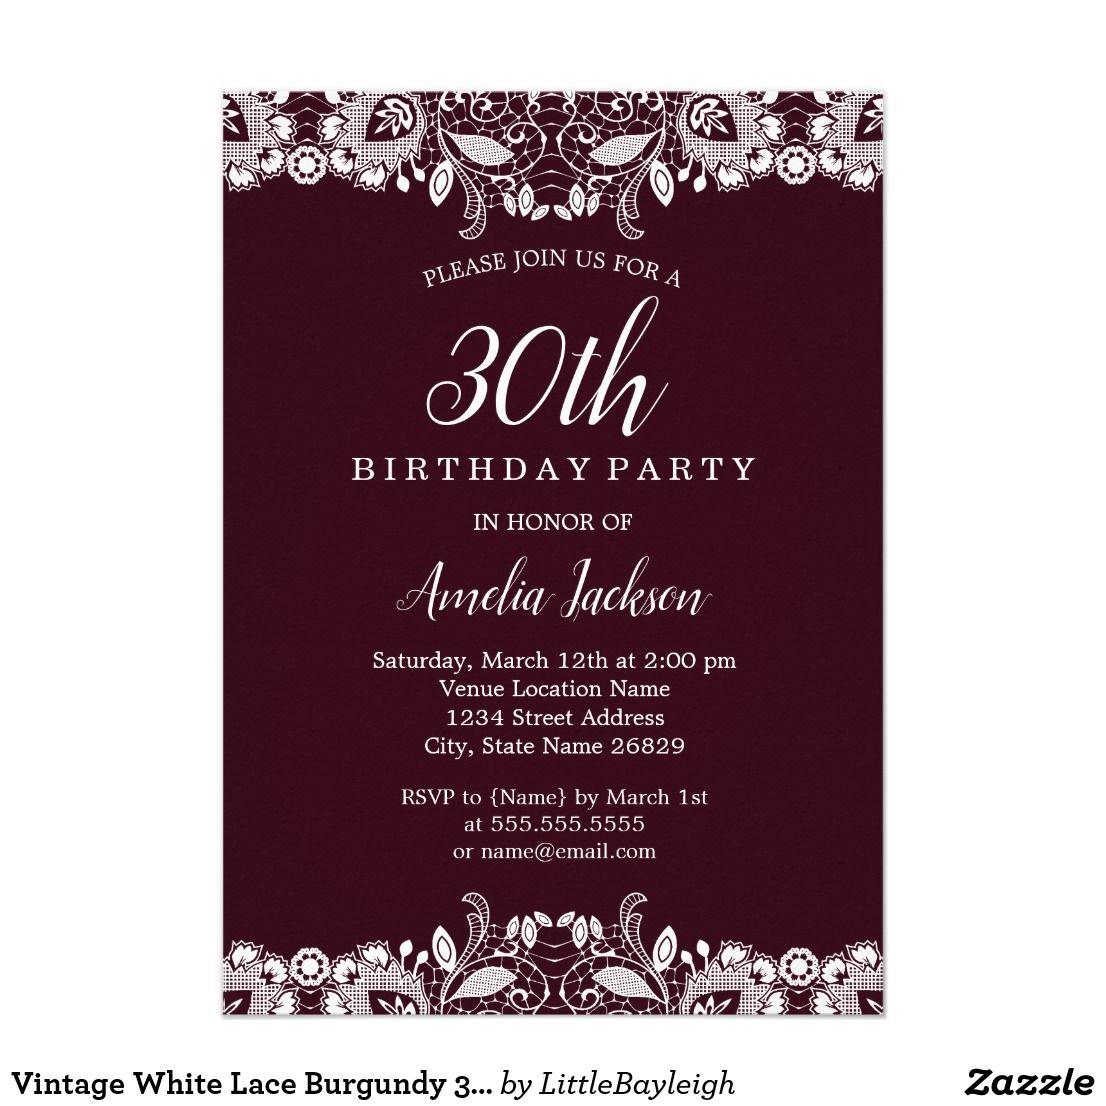 Vintage White Lace Burgundy 30th Birthday Party Card | Birthday ...